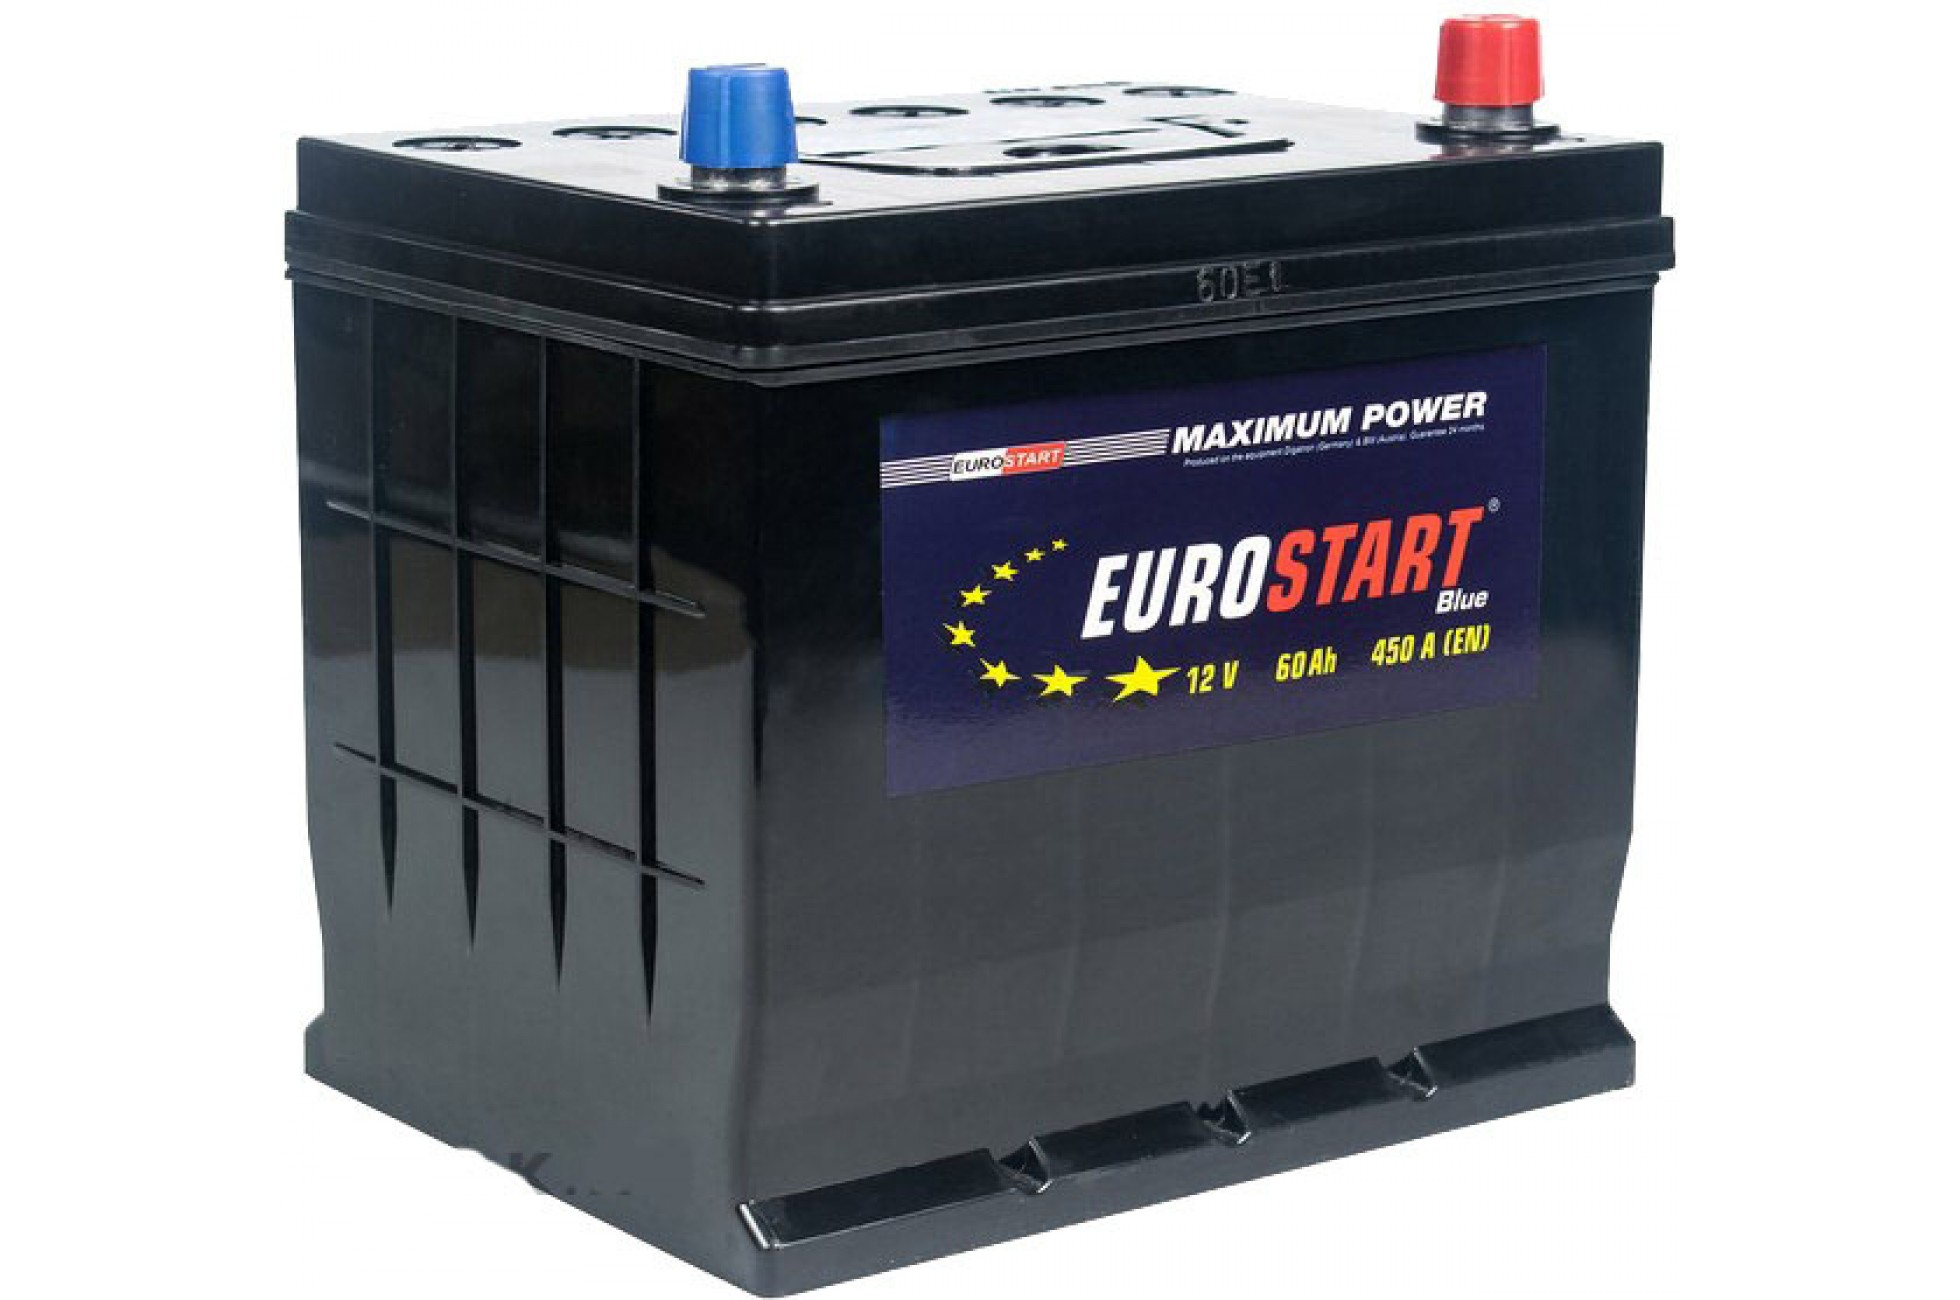 EUROSTART Аккумуляторная батарея автомобильная 60 A/h обратная полярность Asia